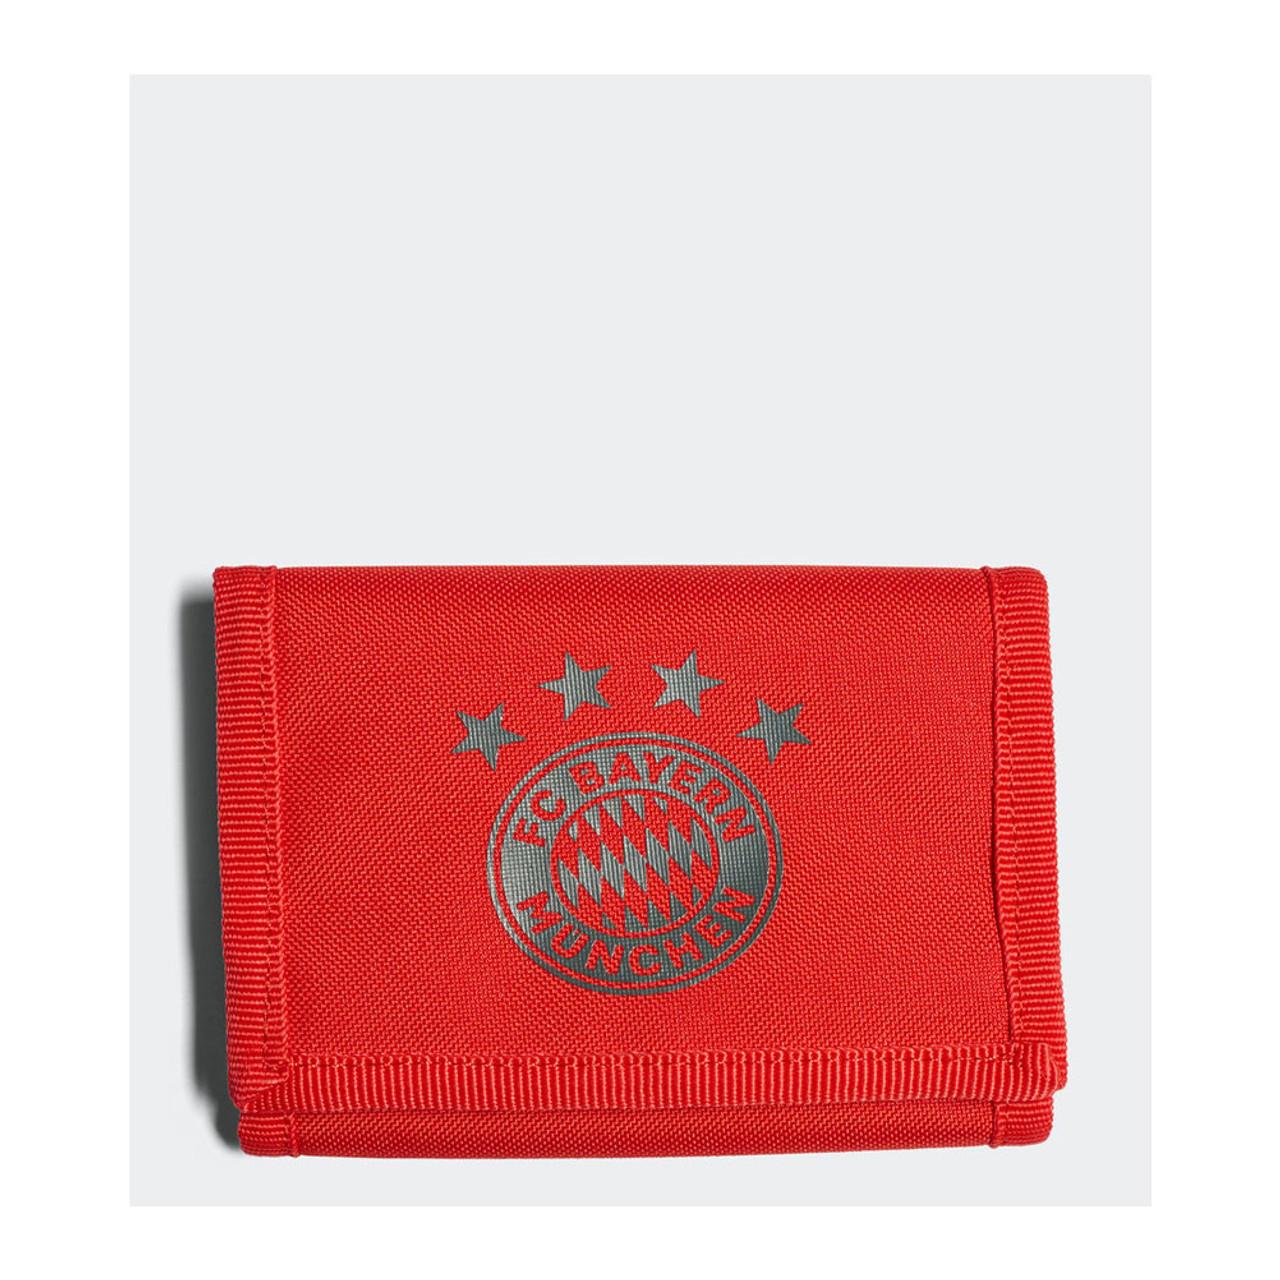 7b00626c9a6 ADIDAS juventus football wallet  black